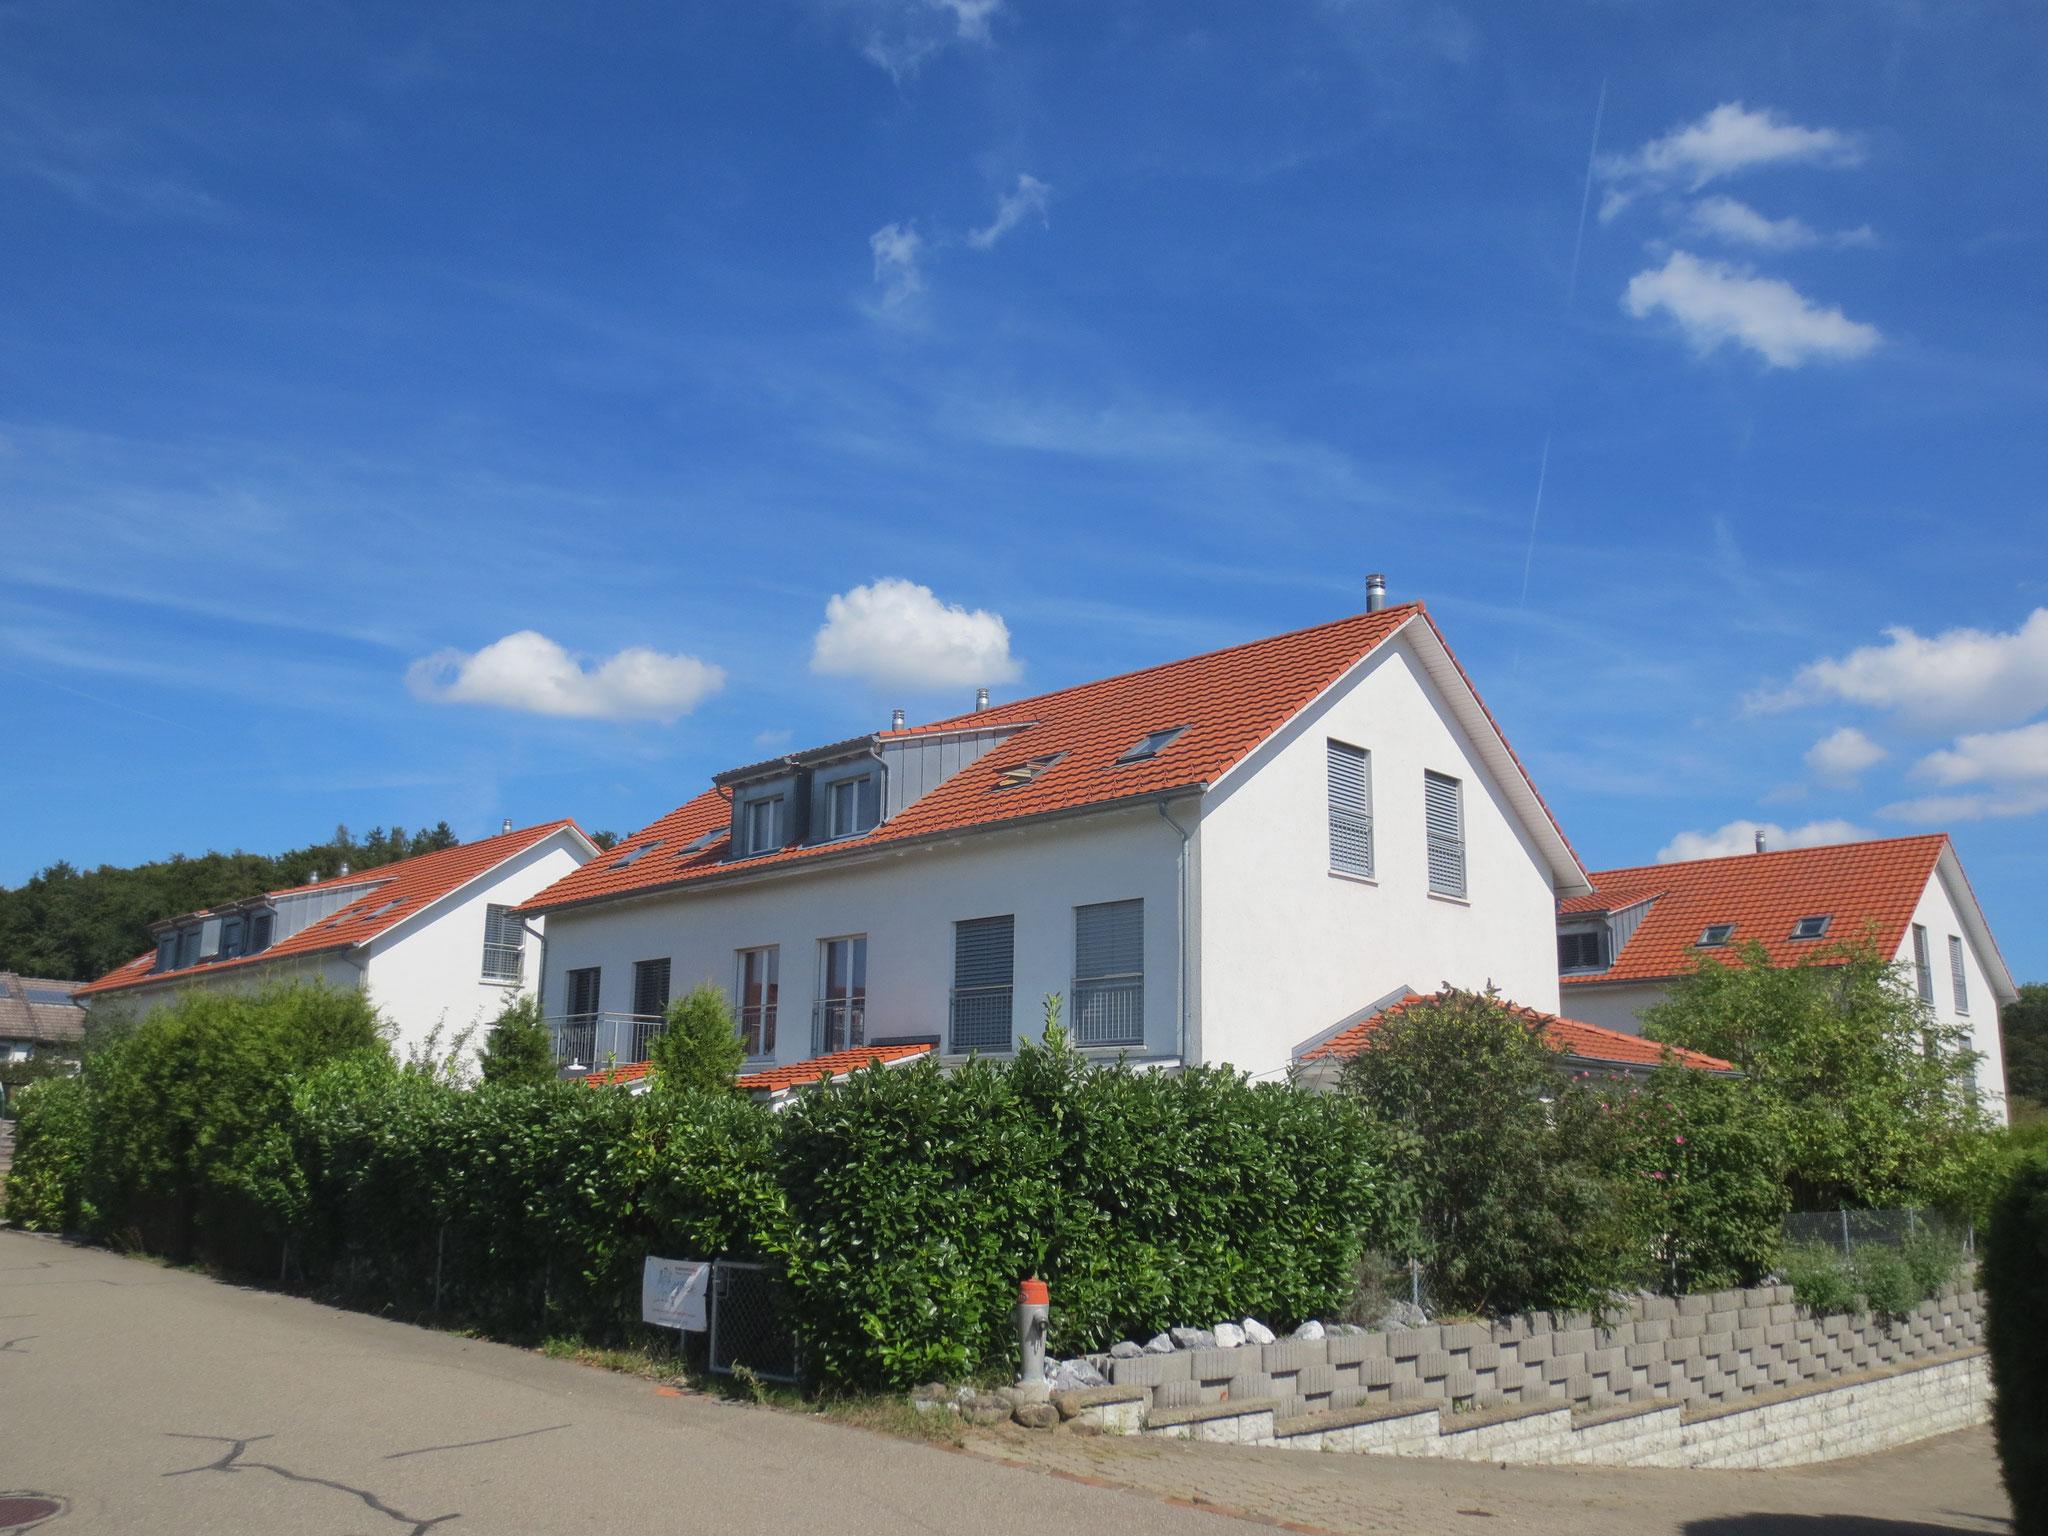 Nürensdorf Reiheneinfamilienhaus 6.5 Zimmer